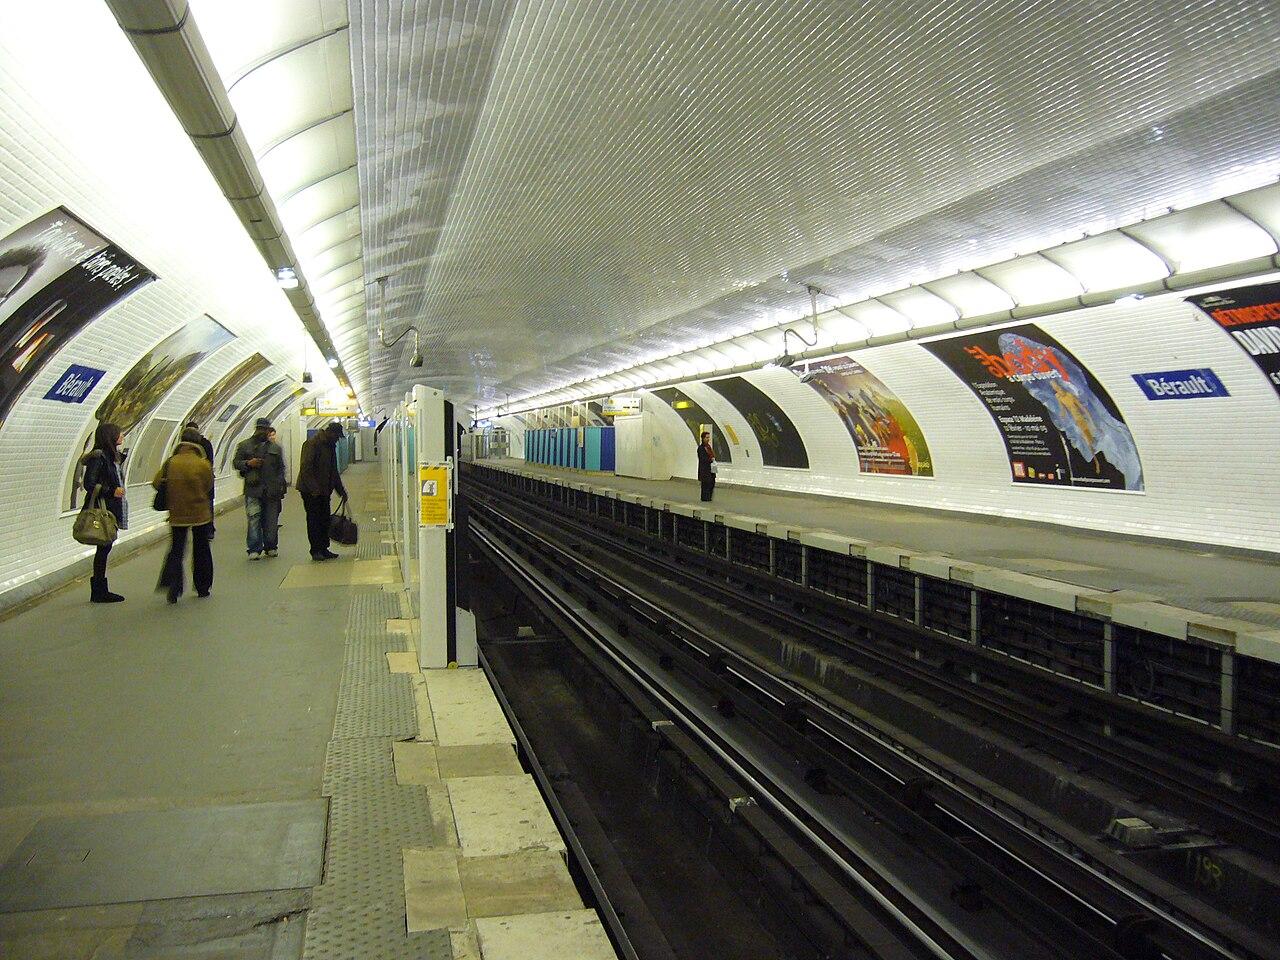 file metro paris ligne 1 berault installation facades de quai 31 jpg wikimedia commons. Black Bedroom Furniture Sets. Home Design Ideas